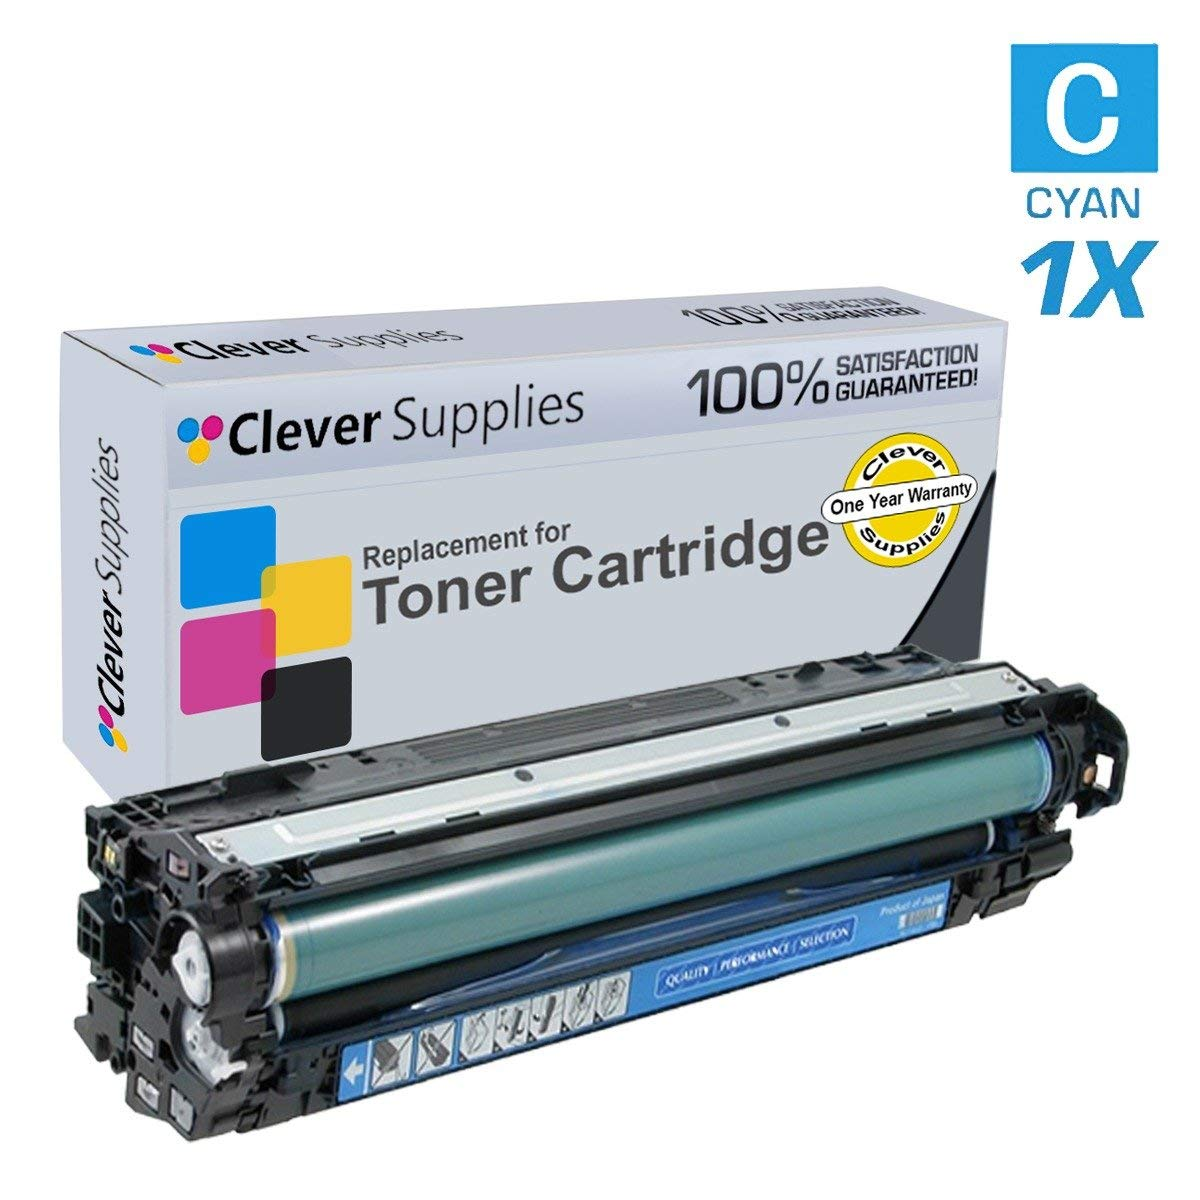 NEW HP CF033A Magenta Toner Cartridge CM4540MFP Genuine